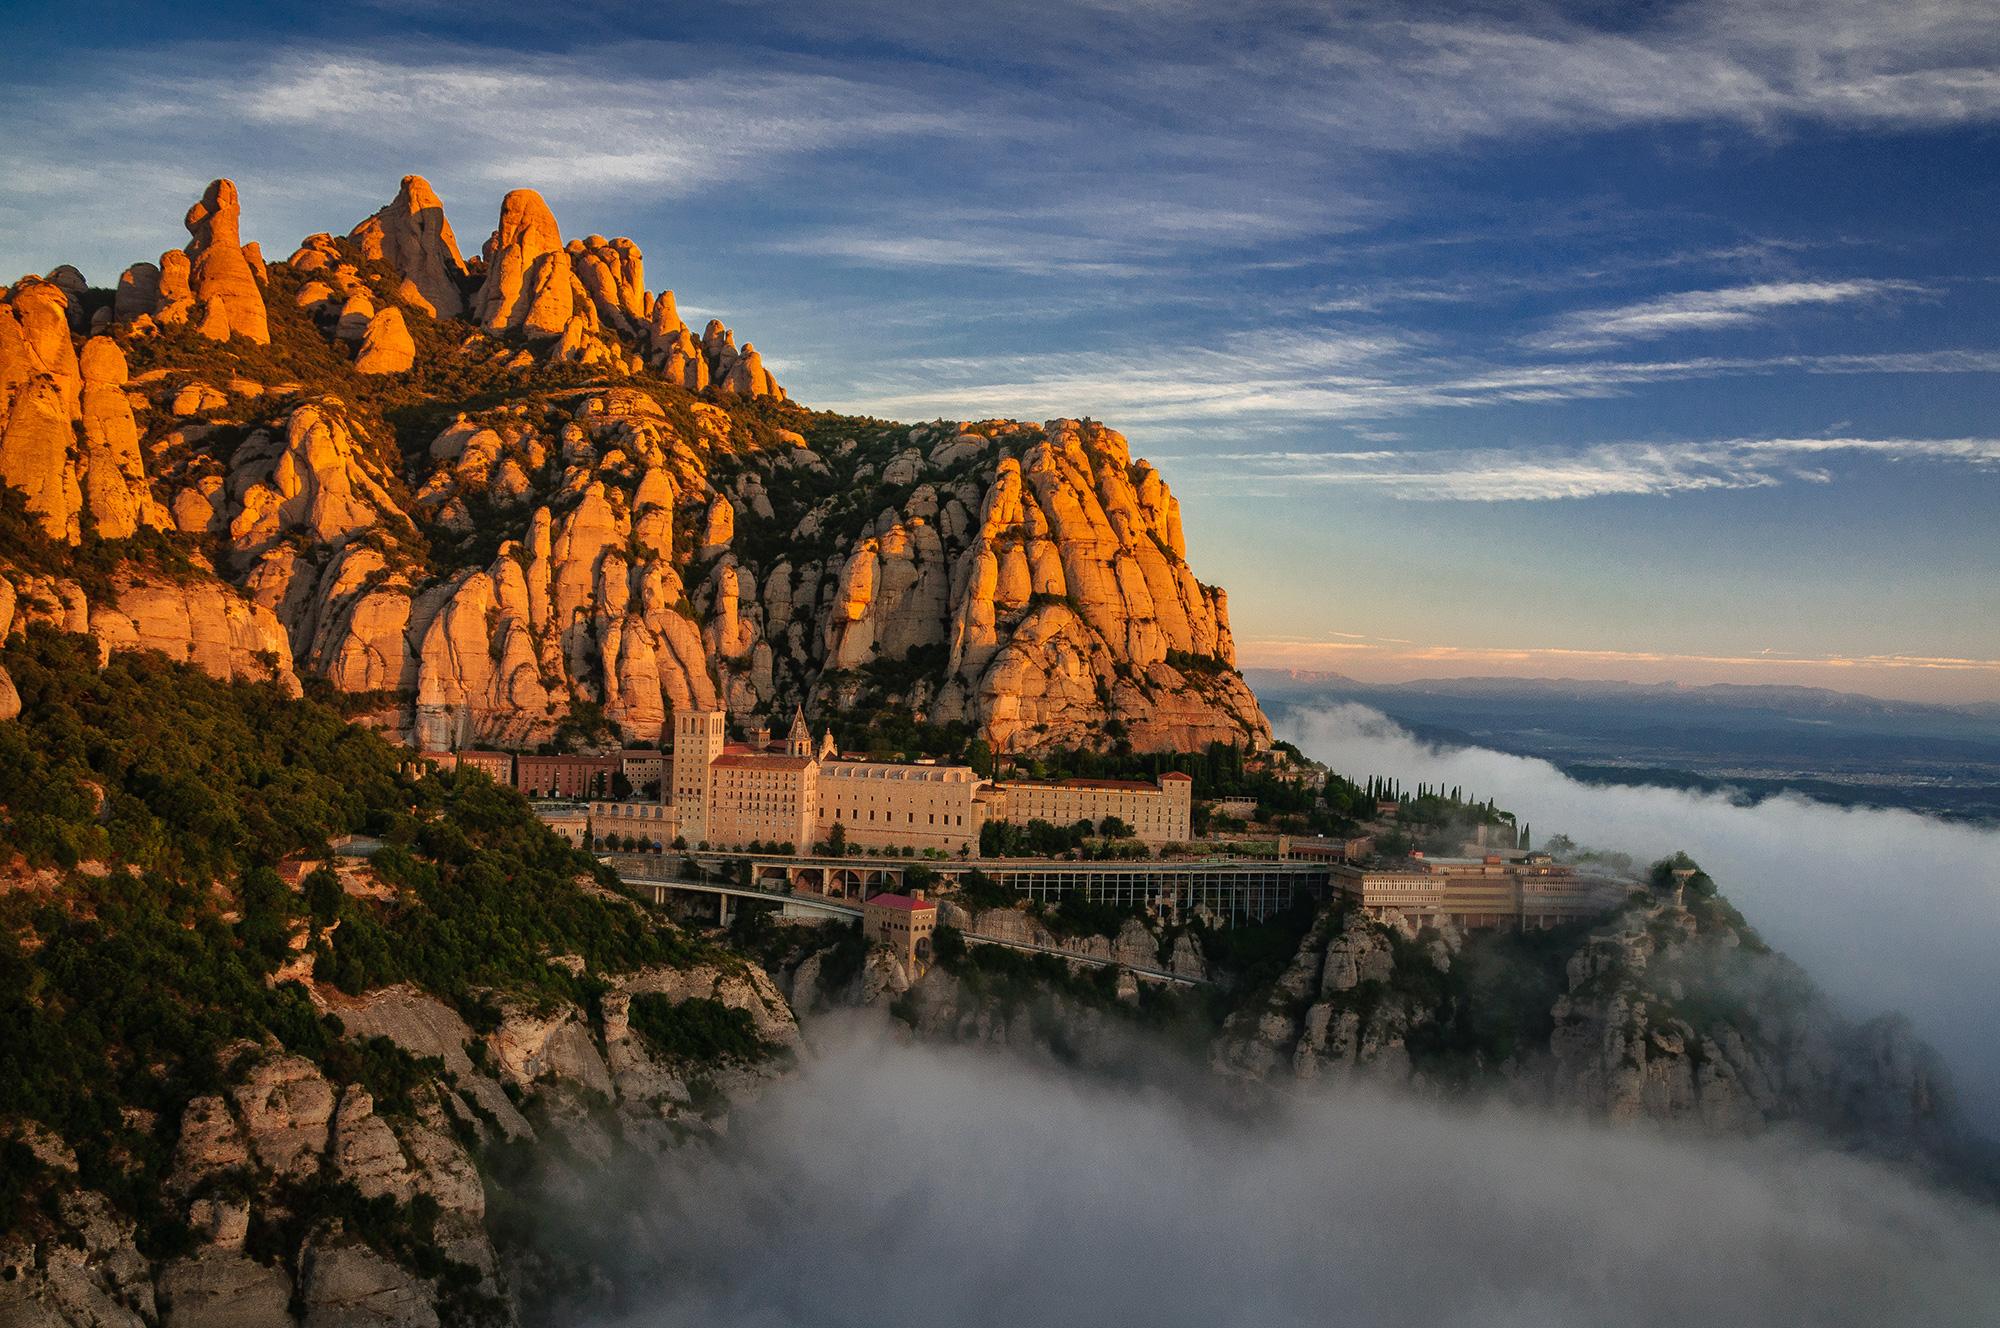 Montserrat-Rutes-Senderisme-Ignasià-S.Boixader-(4)-WEB-RESIZE.jpg